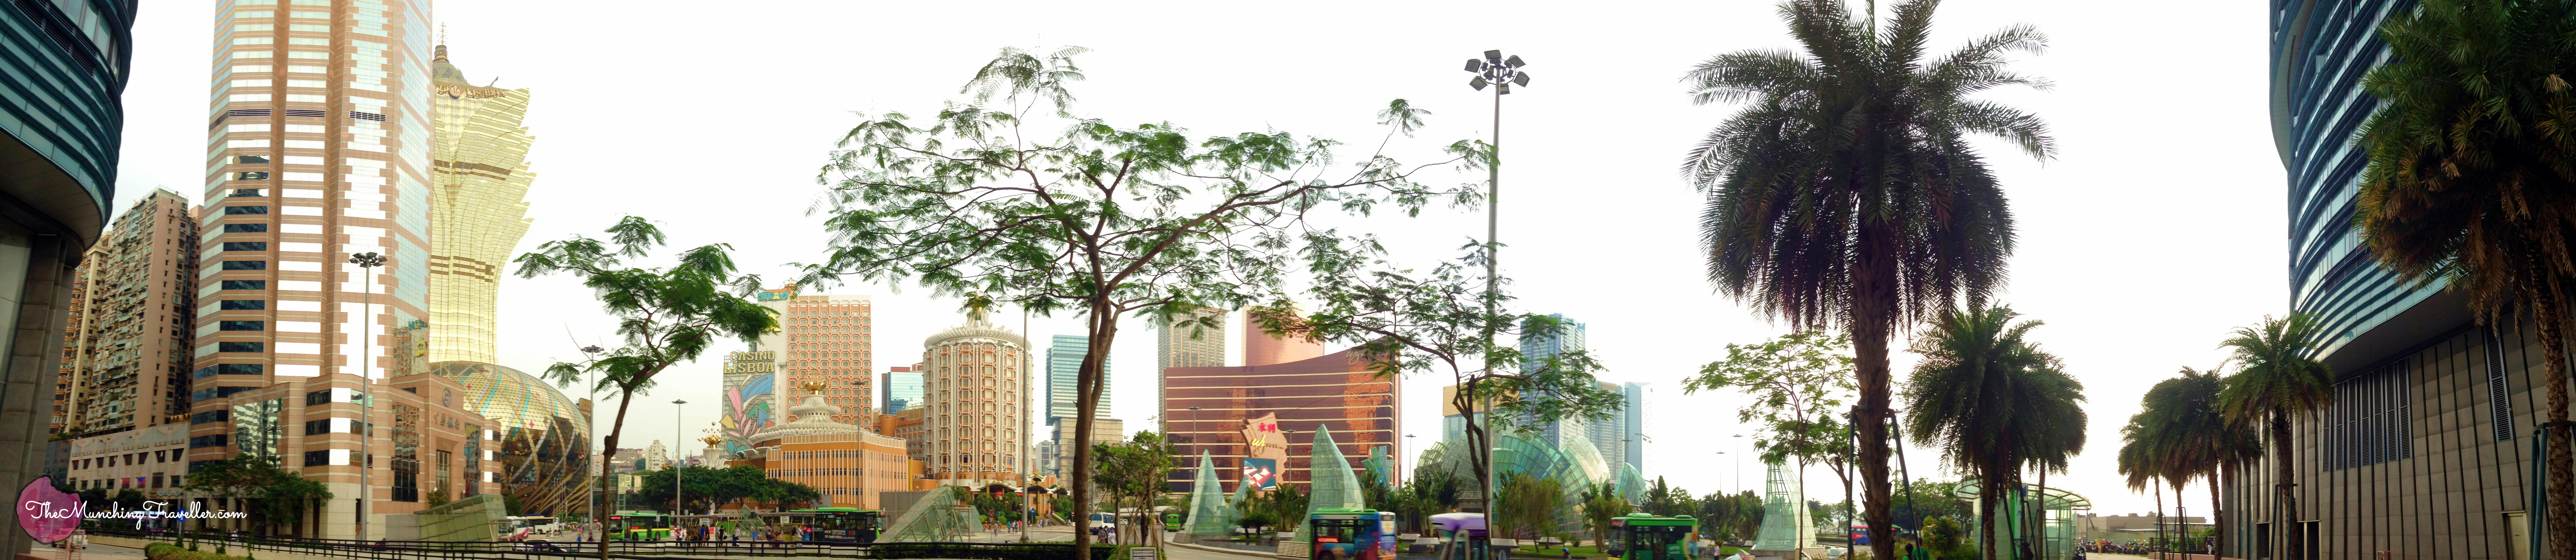 How To Get Macau From Hong Kong Travel And Food Blog The Tiket Cotaijet Ferry Round Trip Hongkong Munching Traveller